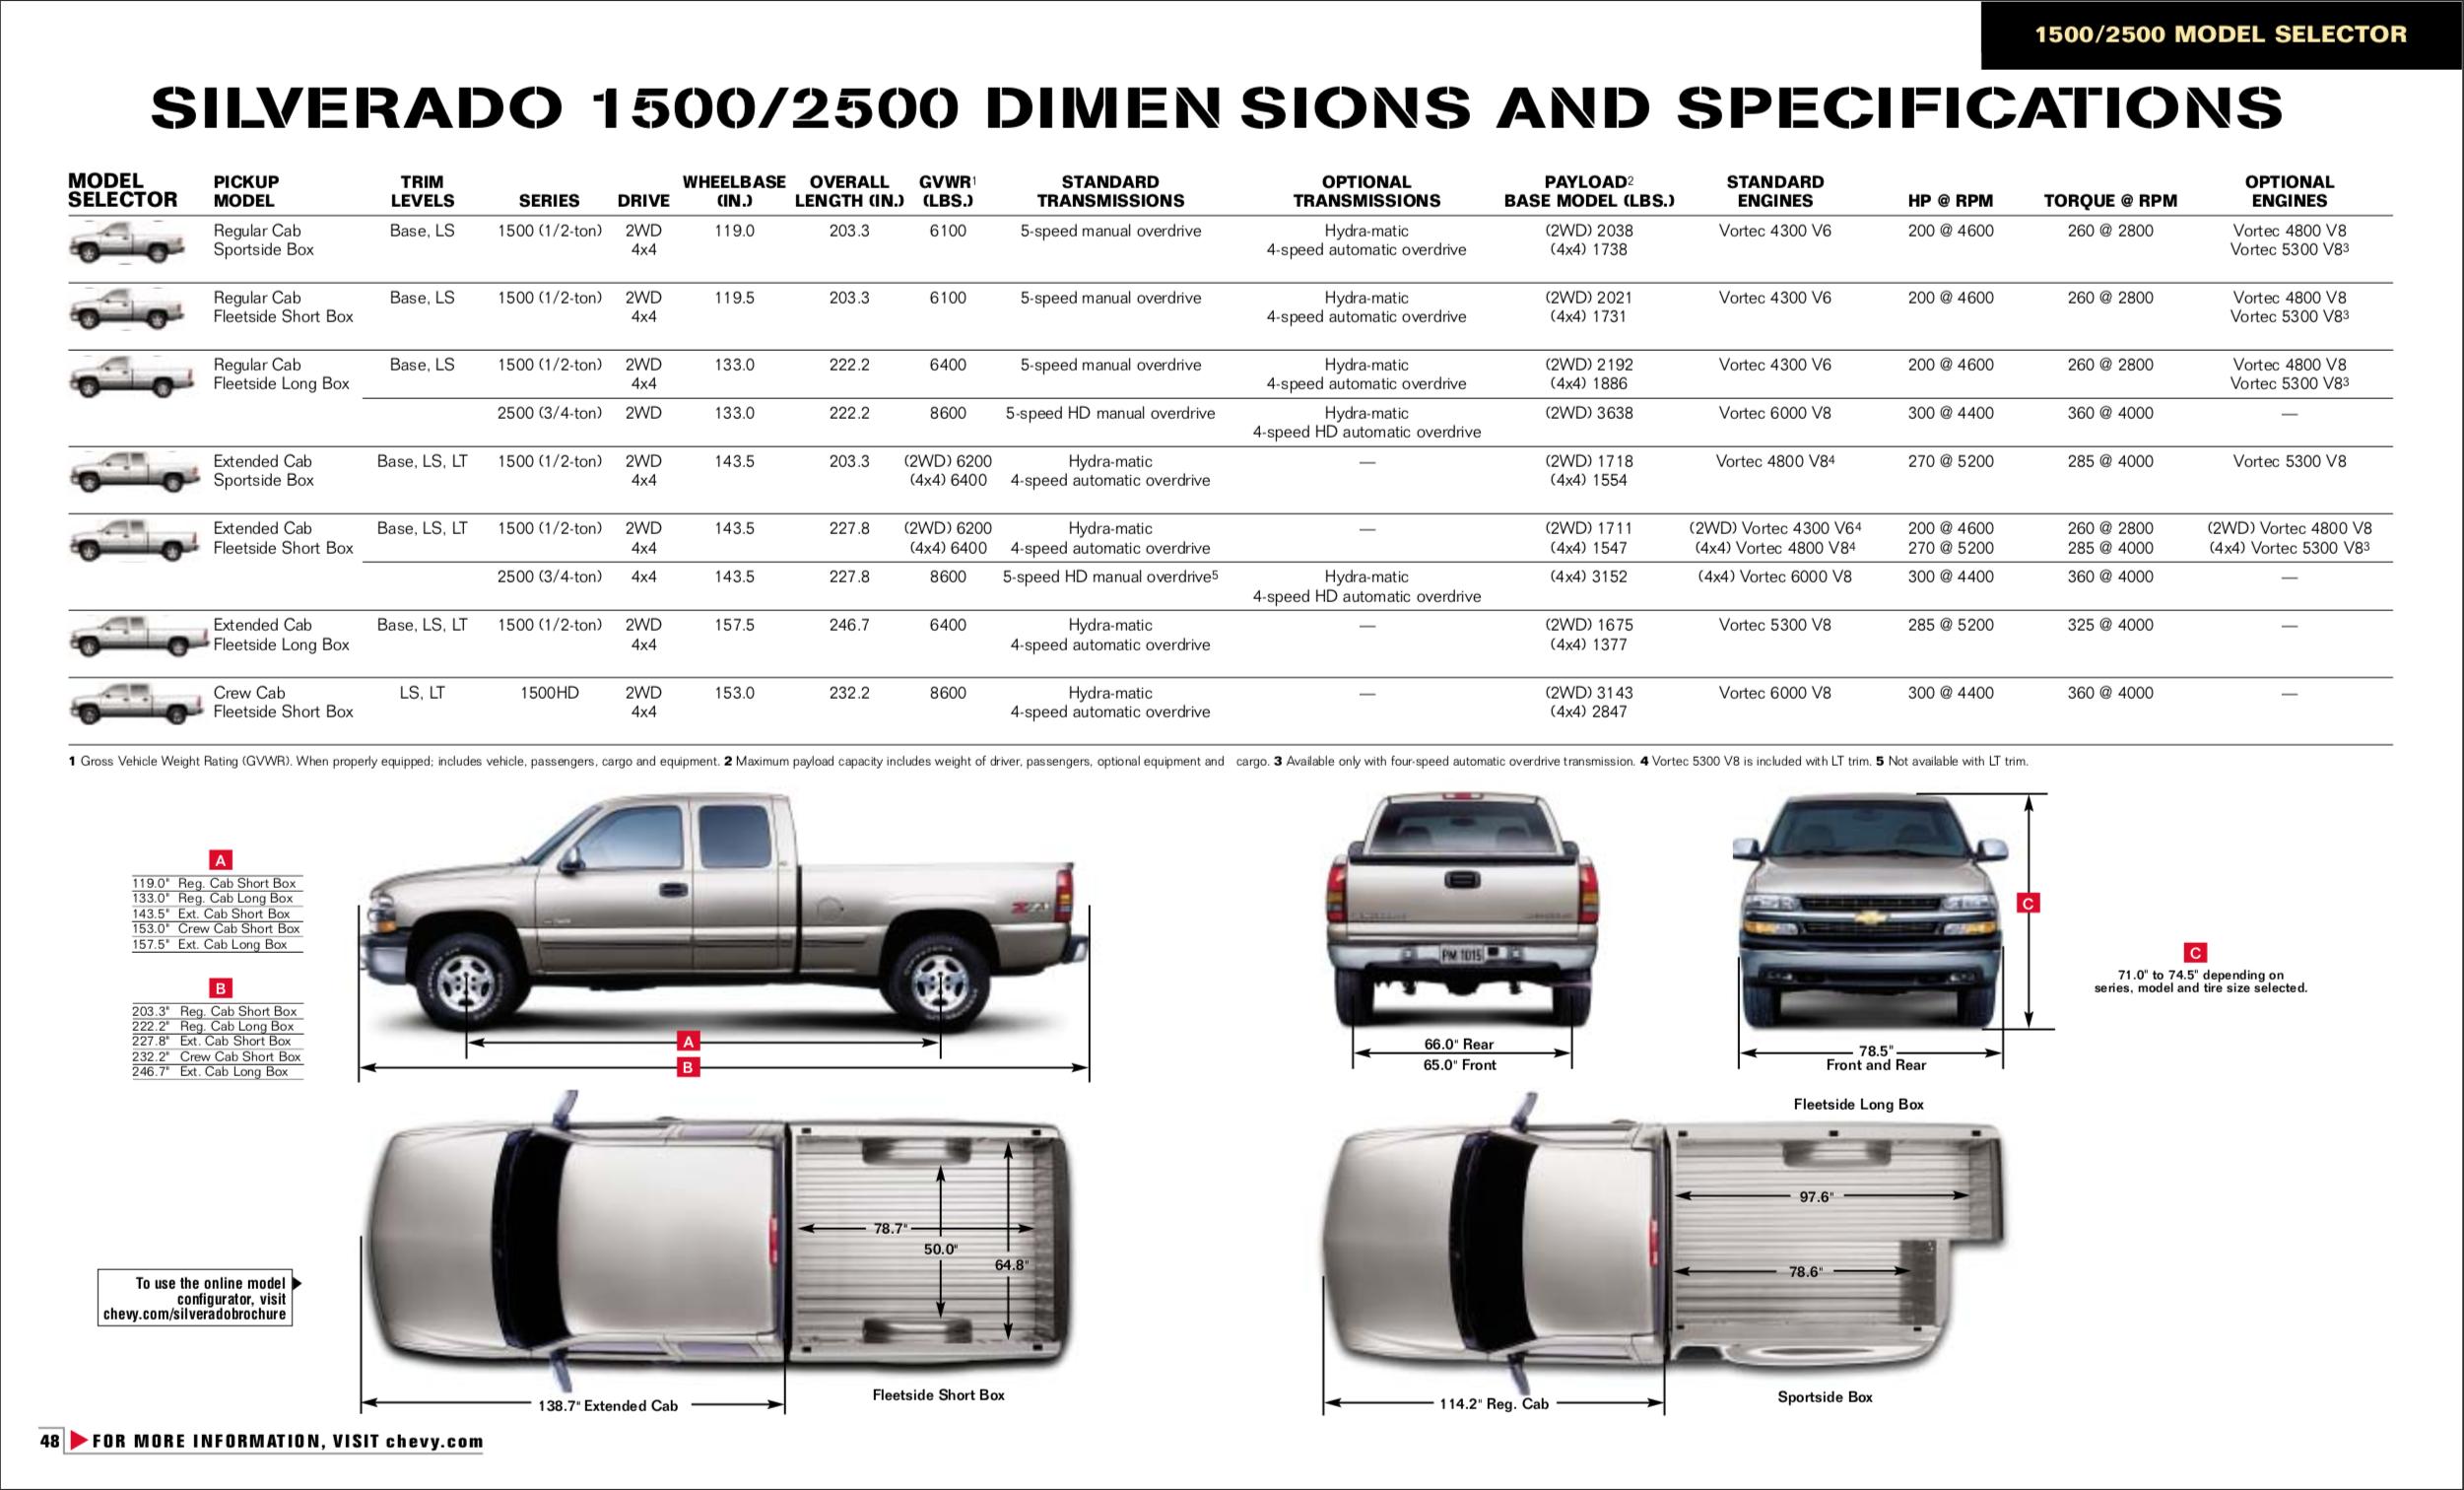 1999 2002 Silverado 1500 2500 Specs Silverado 2001 Silverado Silverado 1500